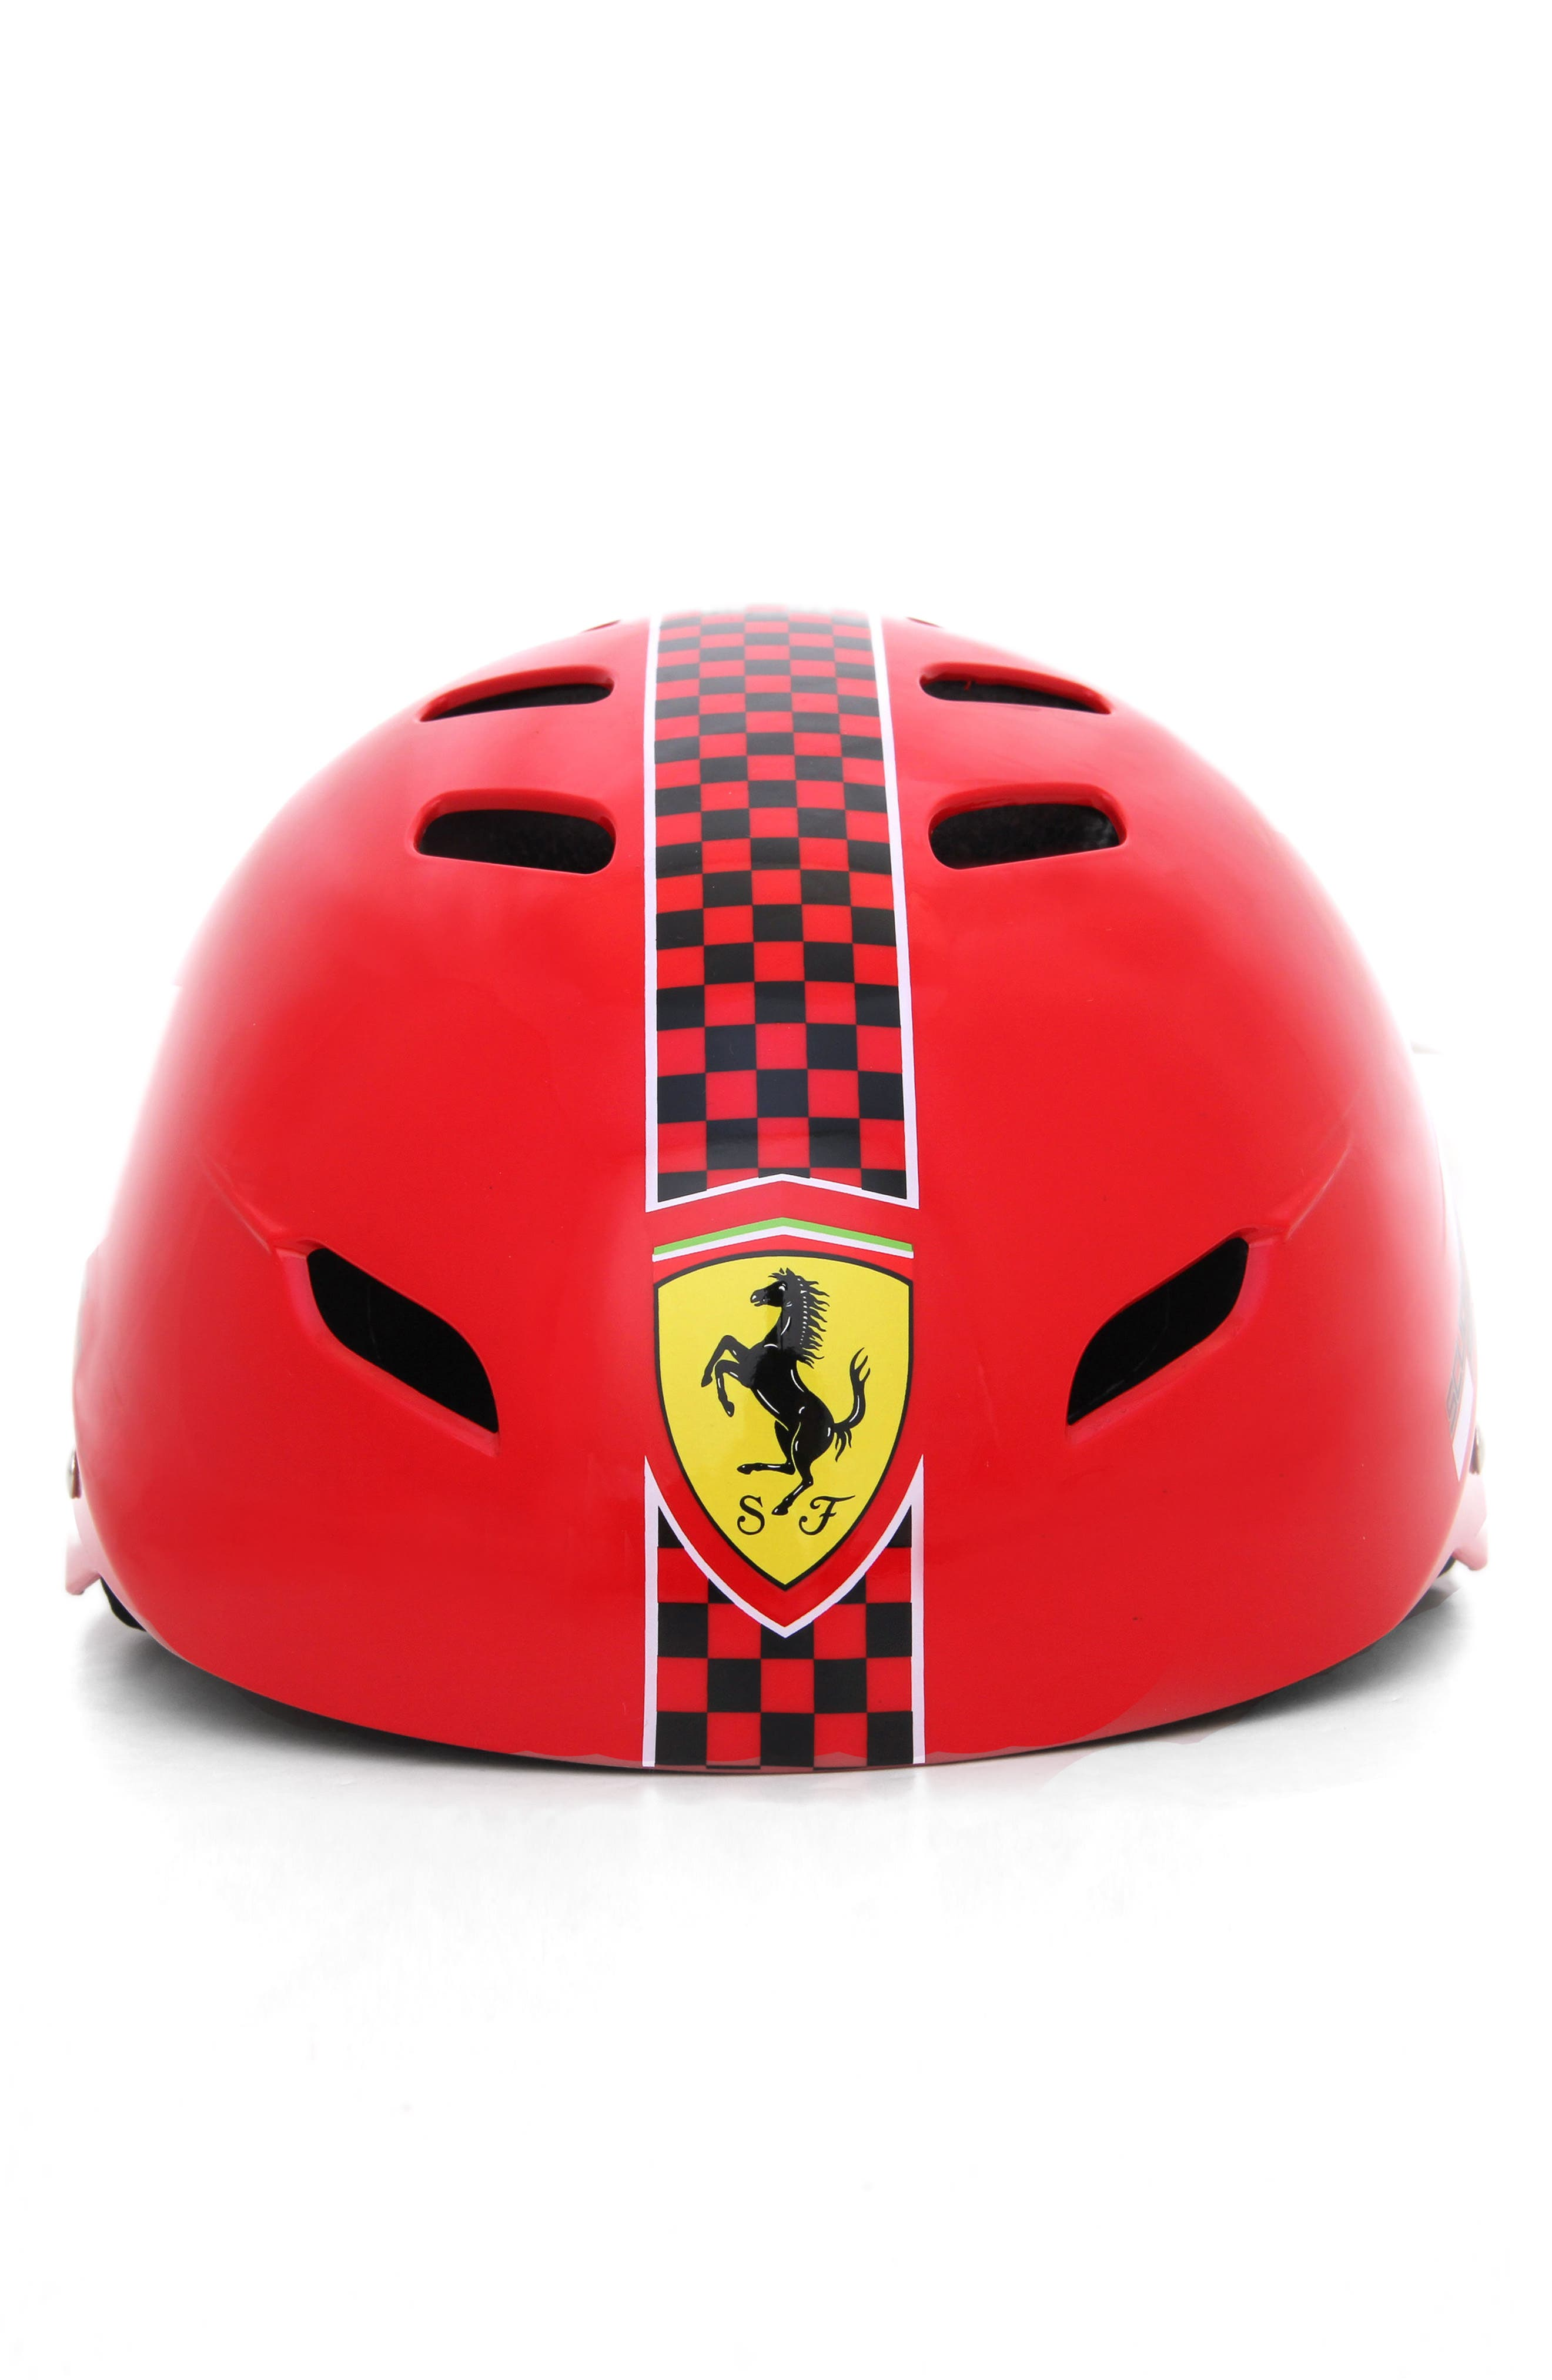 F1 Racing Helmet,                             Main thumbnail 1, color,                             Red